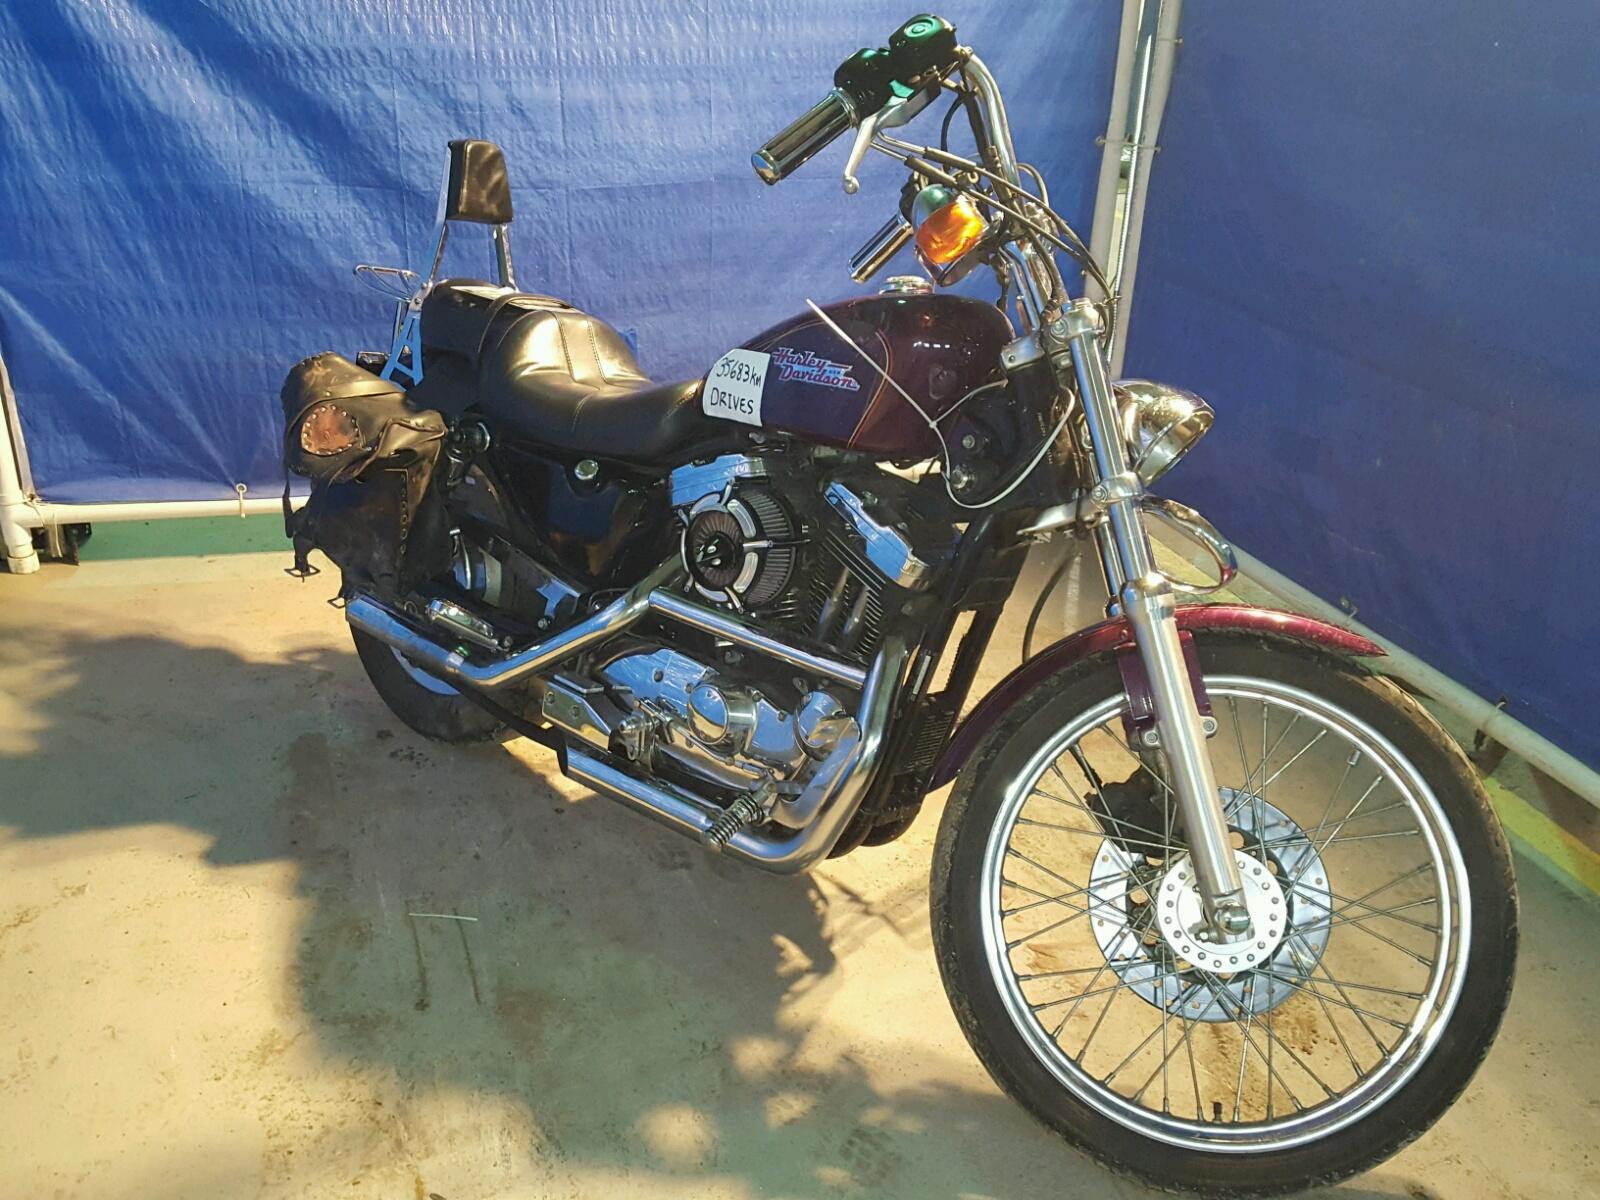 Salvage 1996 Harley-Davidson XL1200 C for sale